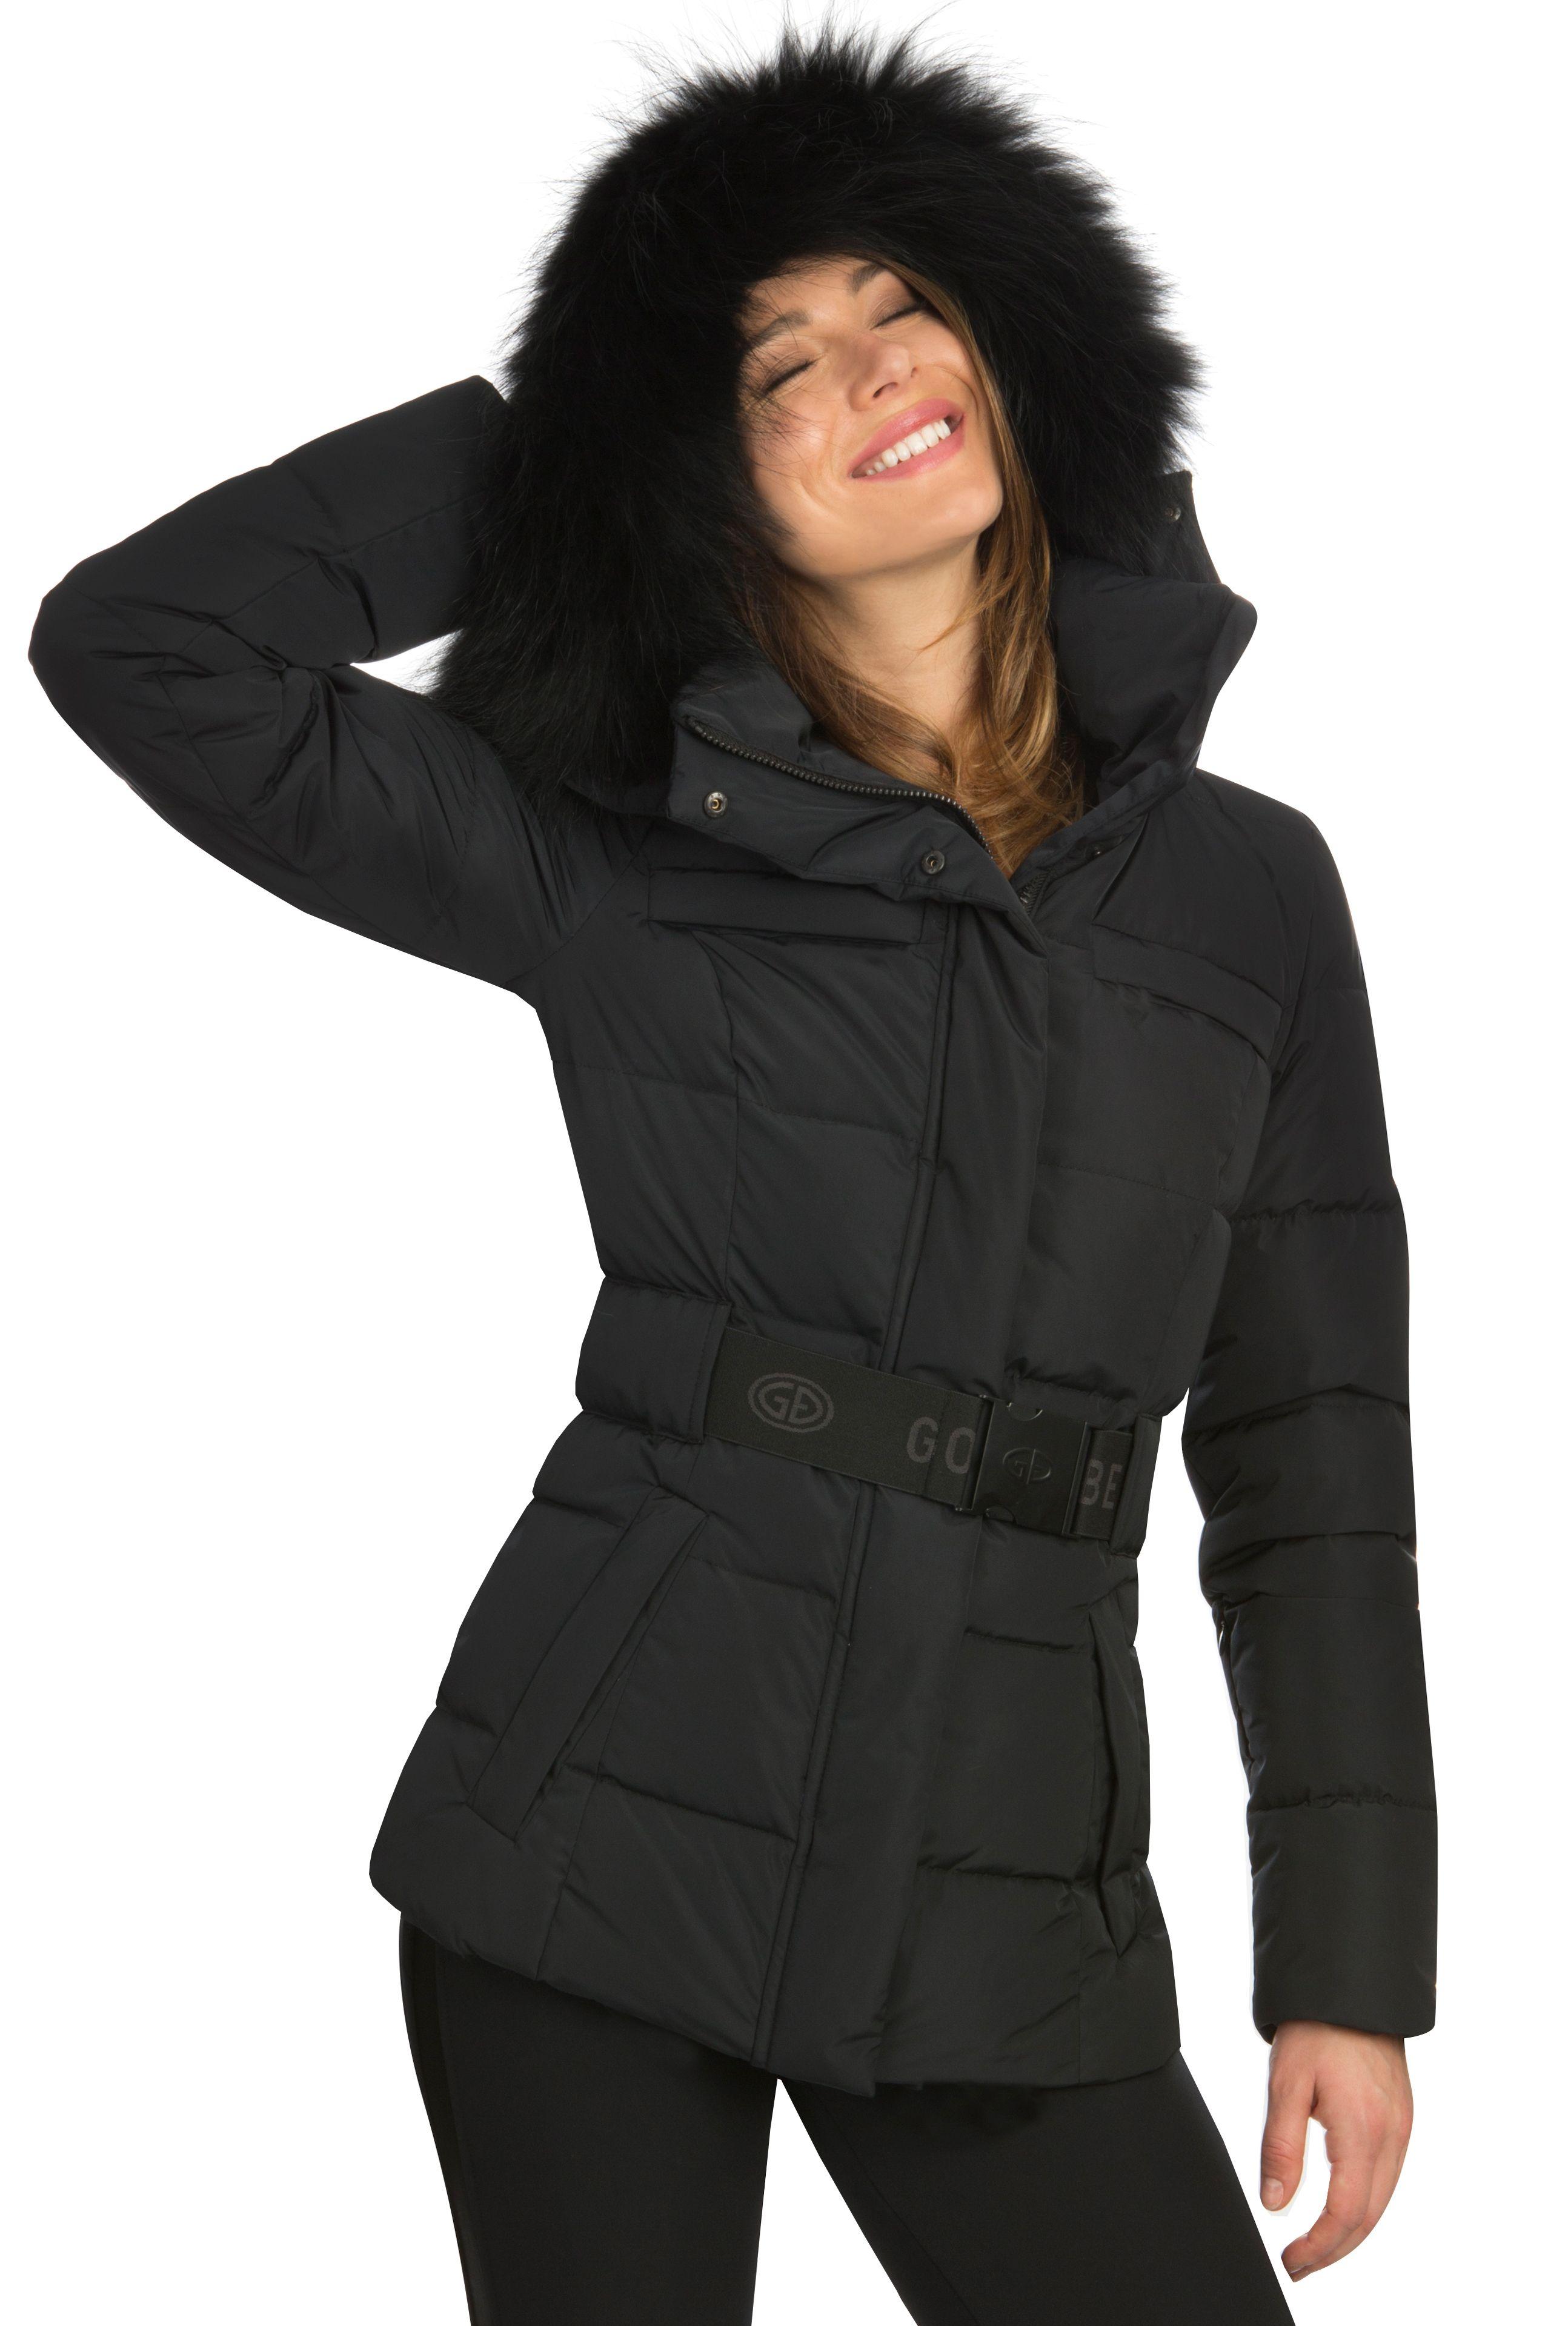 Goldbergh Jodie Ski Jacket In Black With Black Fur Trimmed Hood Fur Hood Jacket Down Ski Jacket Black Ski Jacket